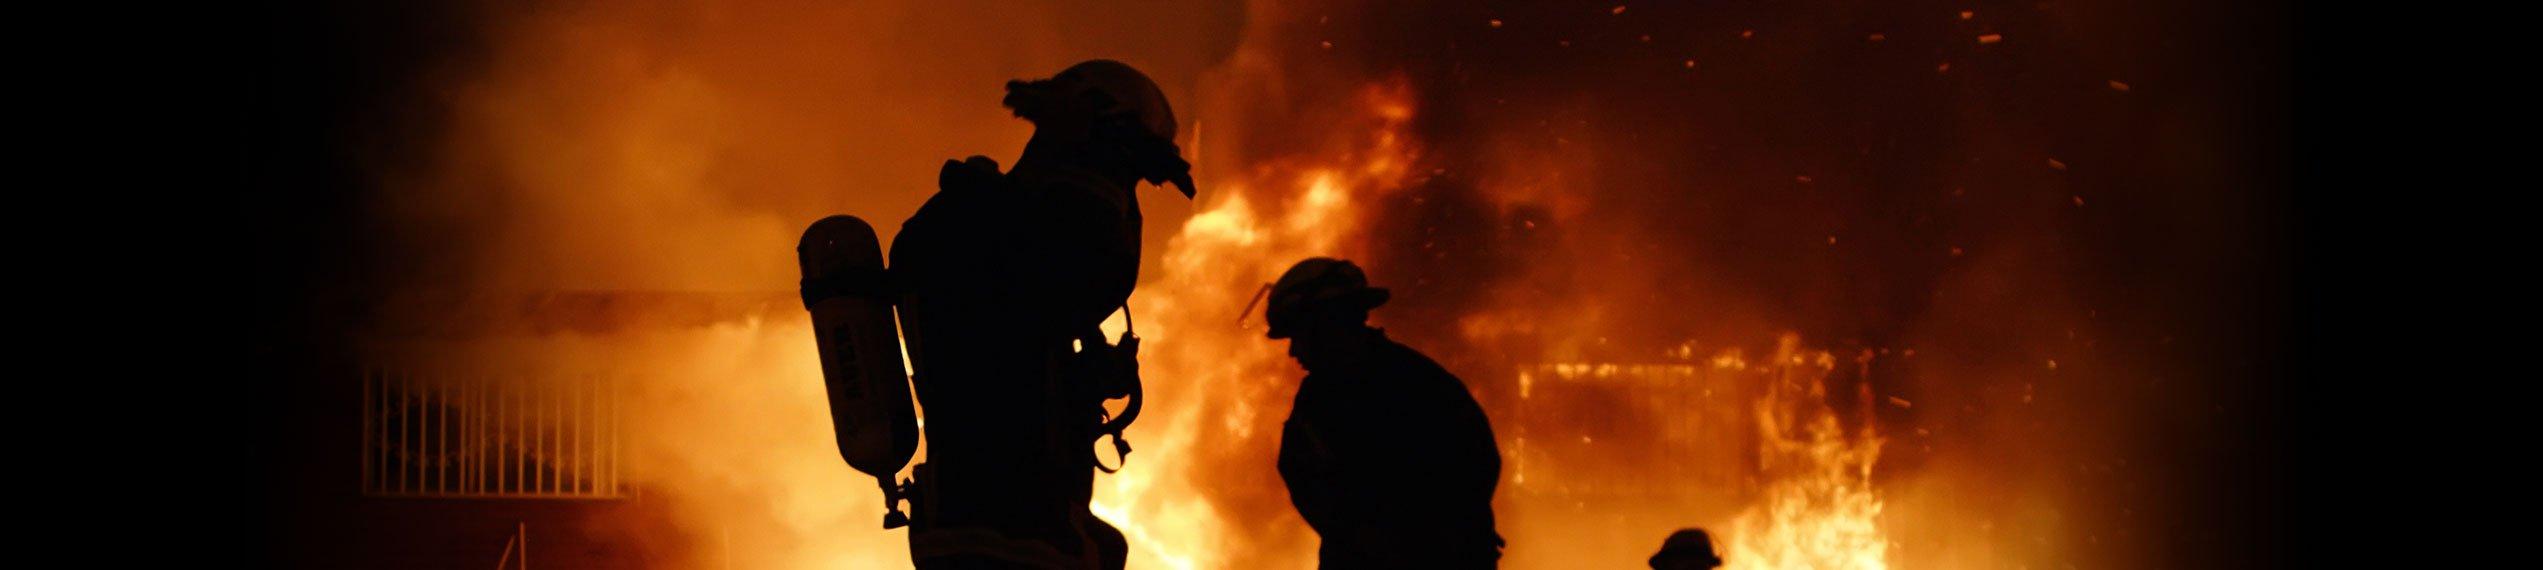 Fire & Smoke Damage Removal in Paul Davis Restoration of Northwest Kentucky